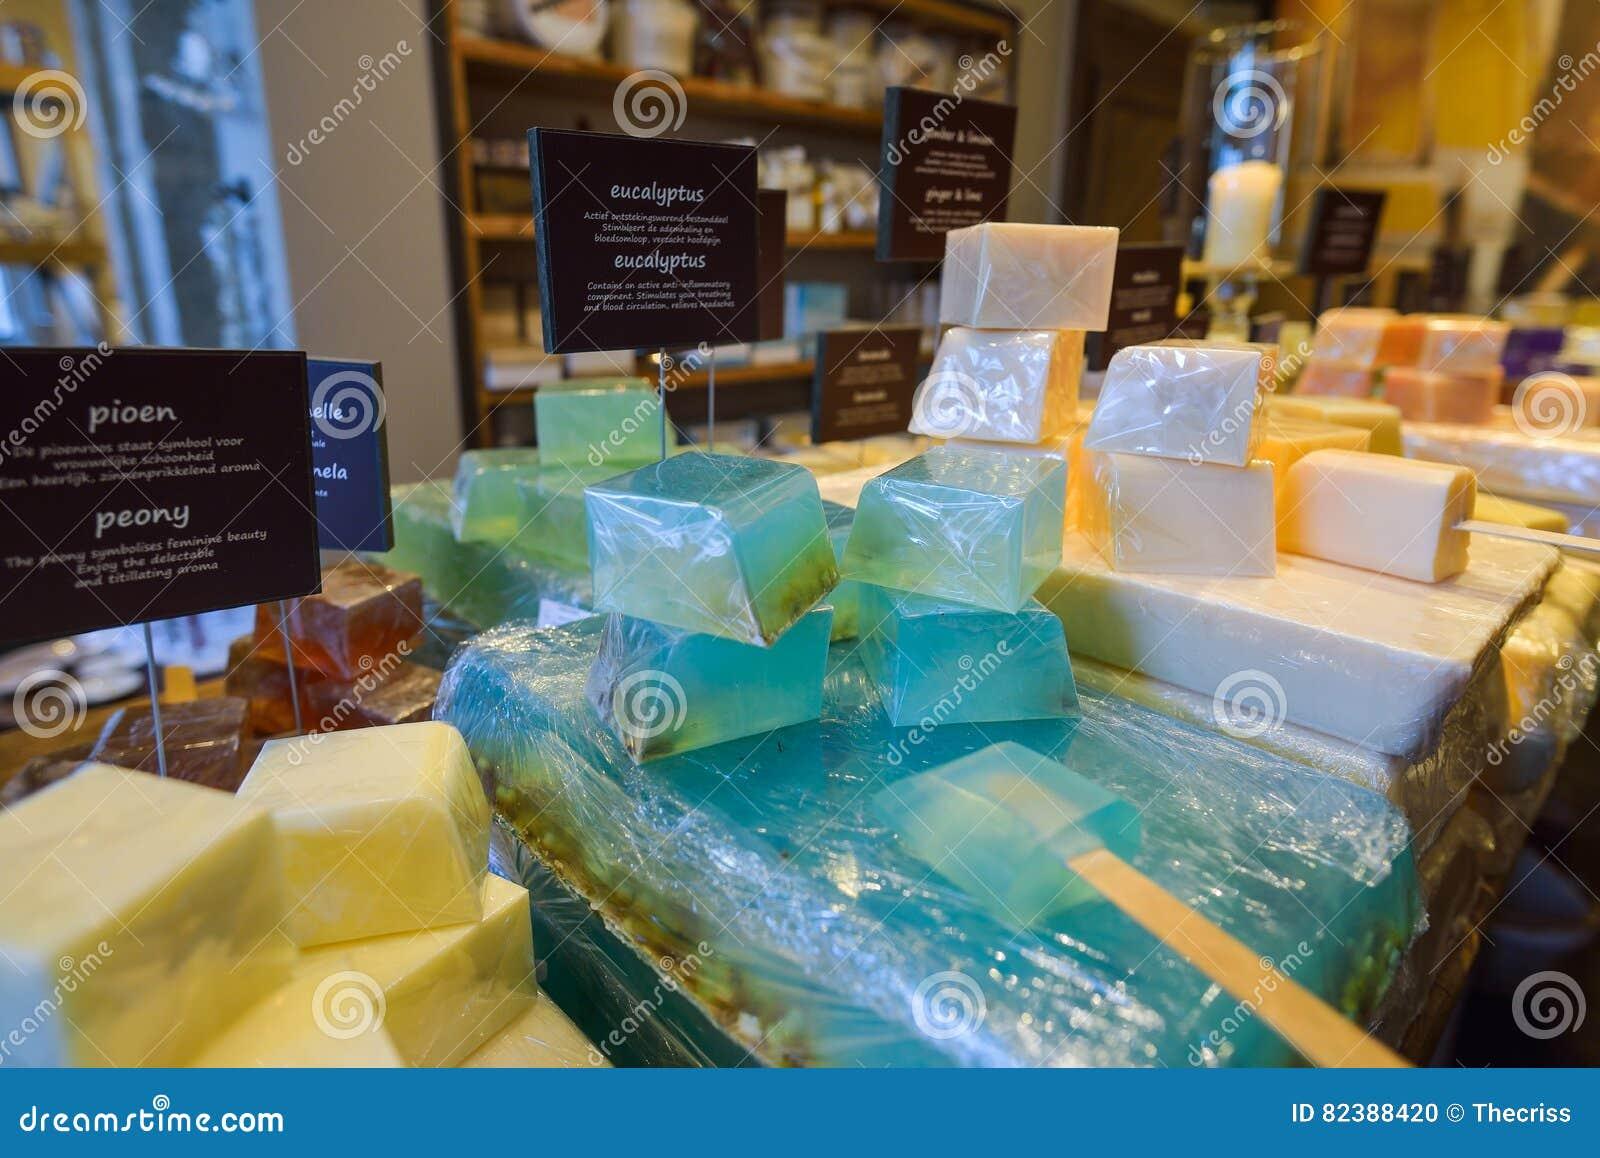 GHENT, BELGIUM - DECEMBER 05 2016 - Handmade Soap Displayed